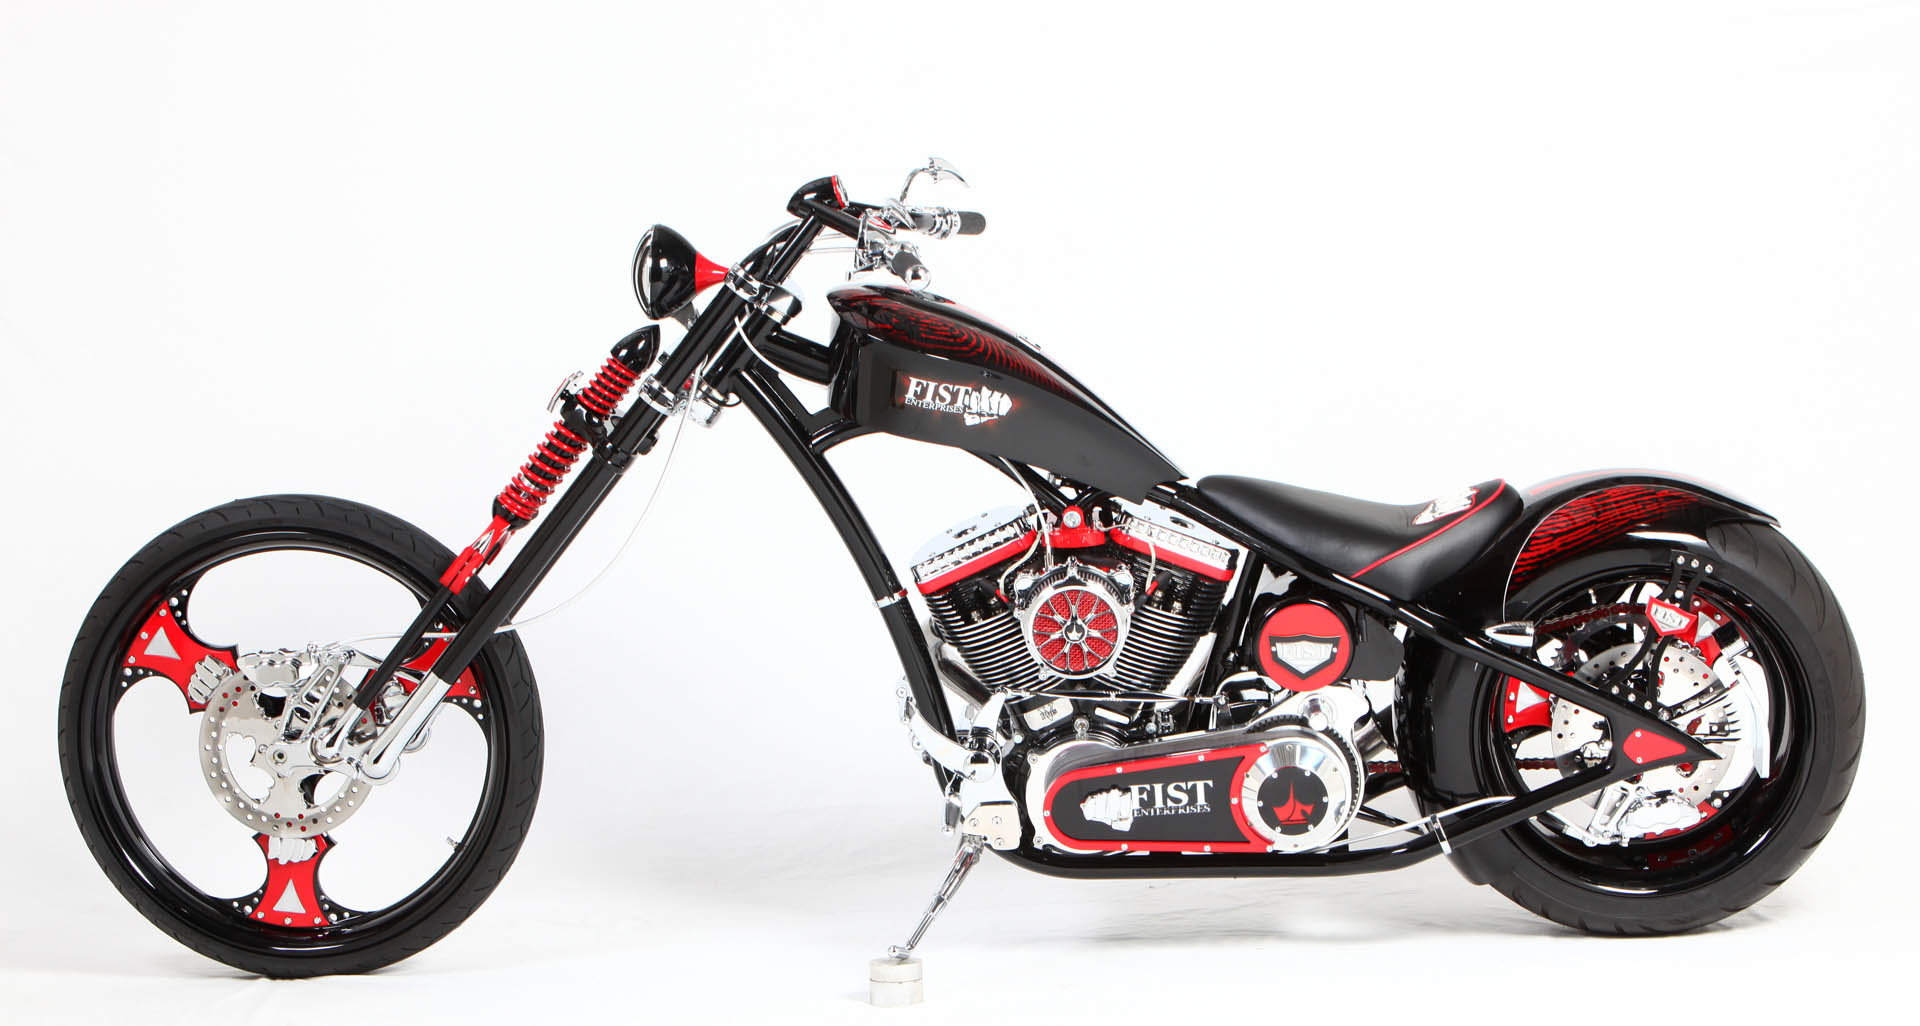 paul-jr-designs-fist-bike-041